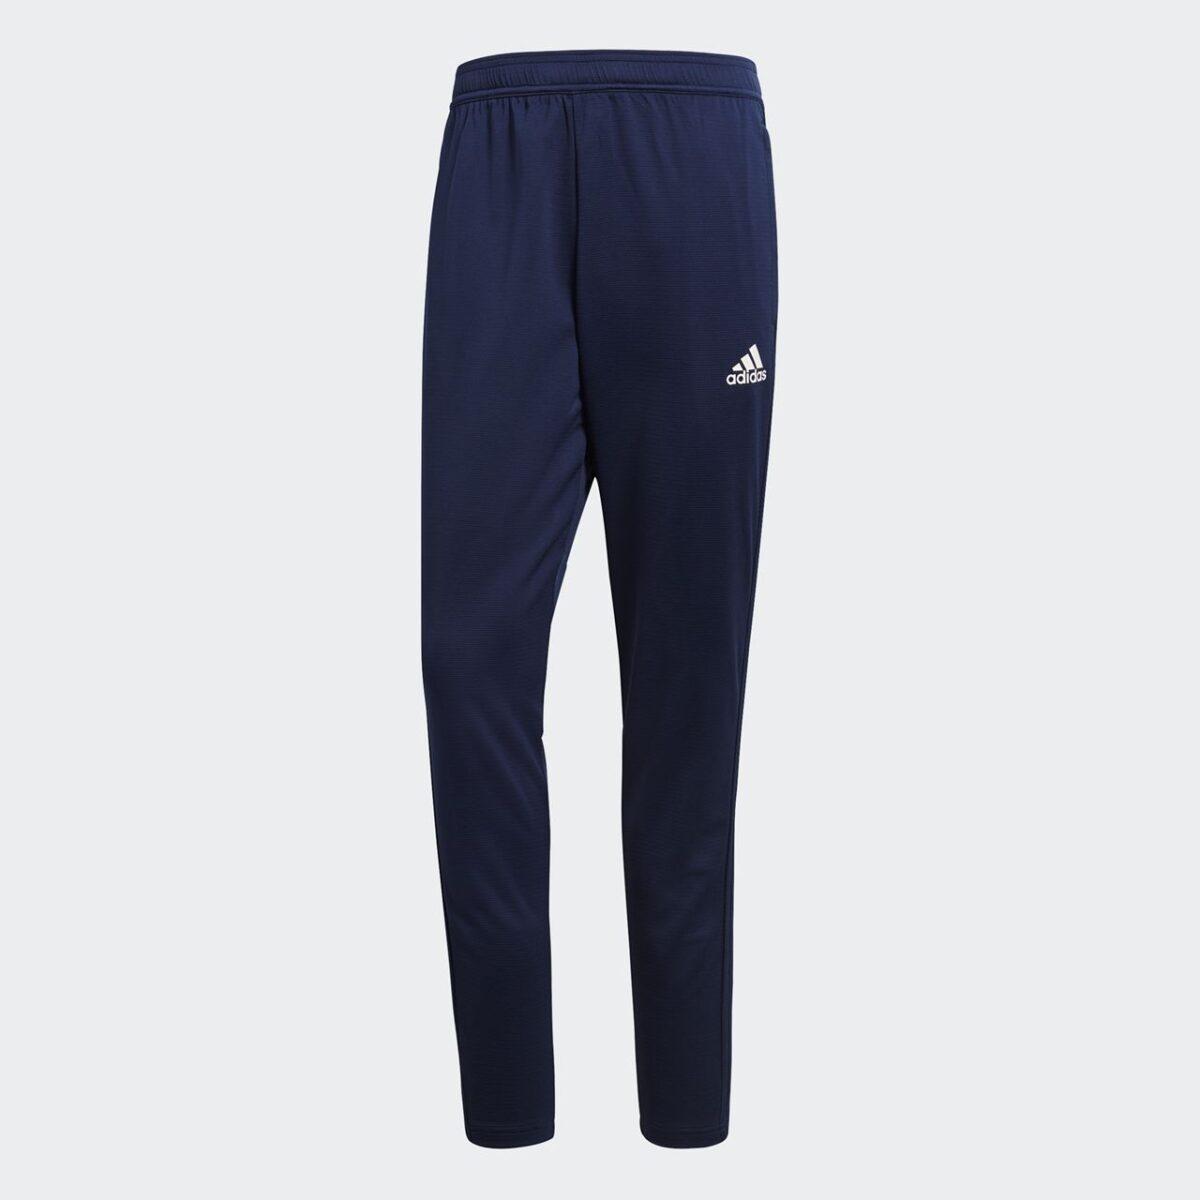 Adidas Condivo 18 Training LC Pant